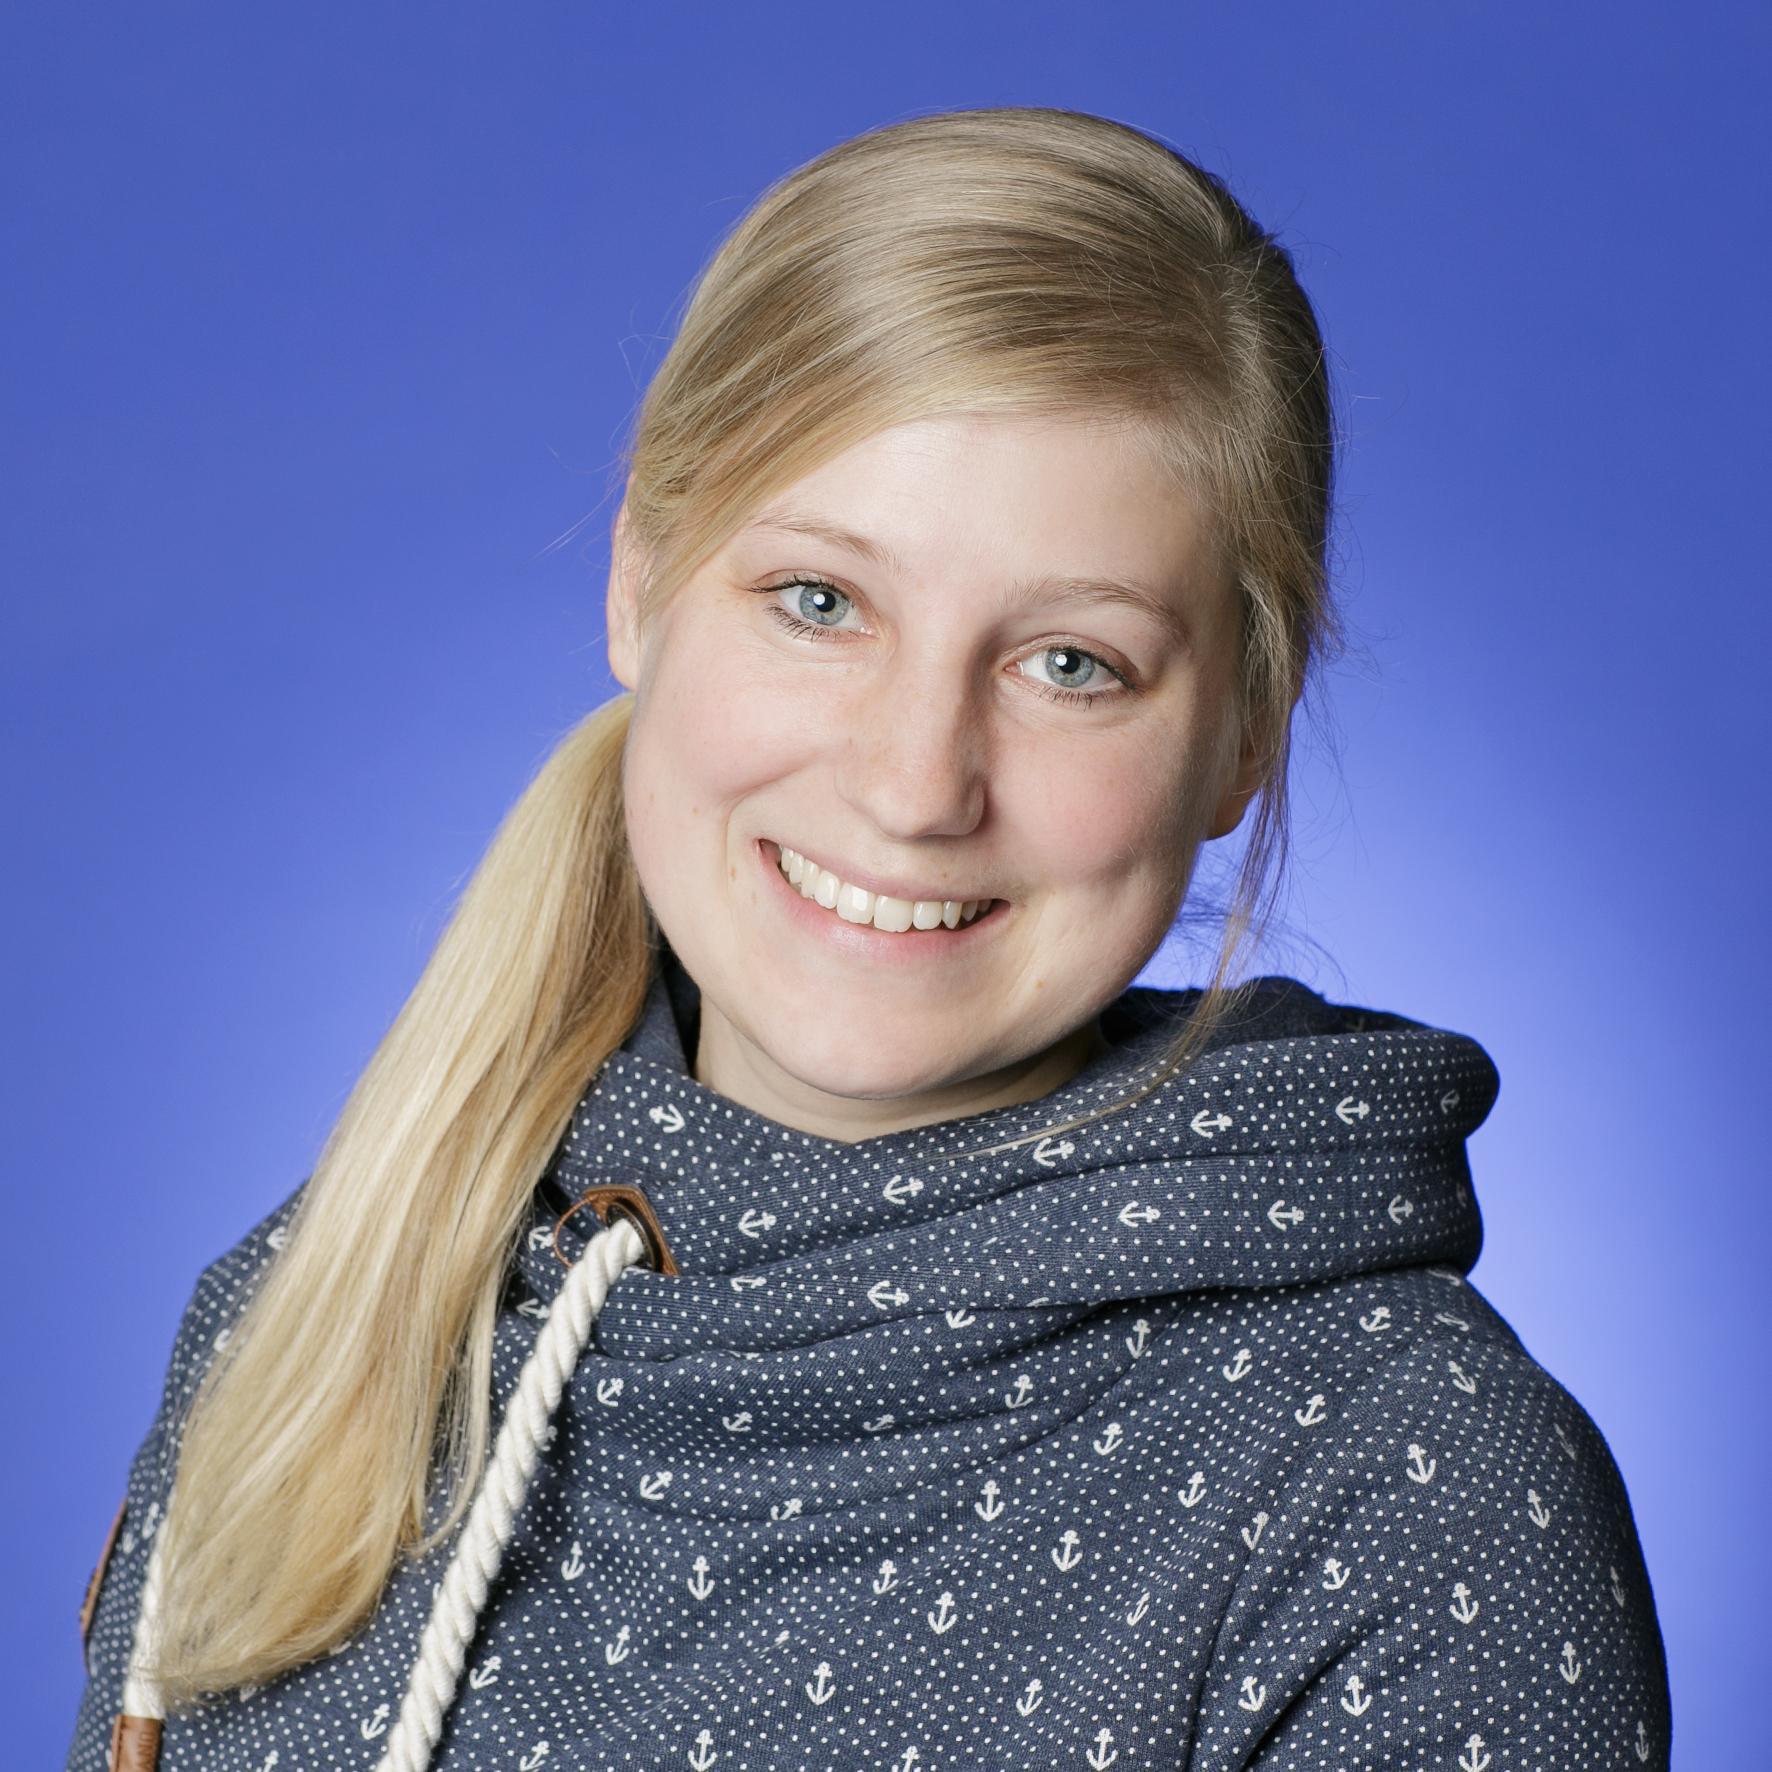 Verena Clausen